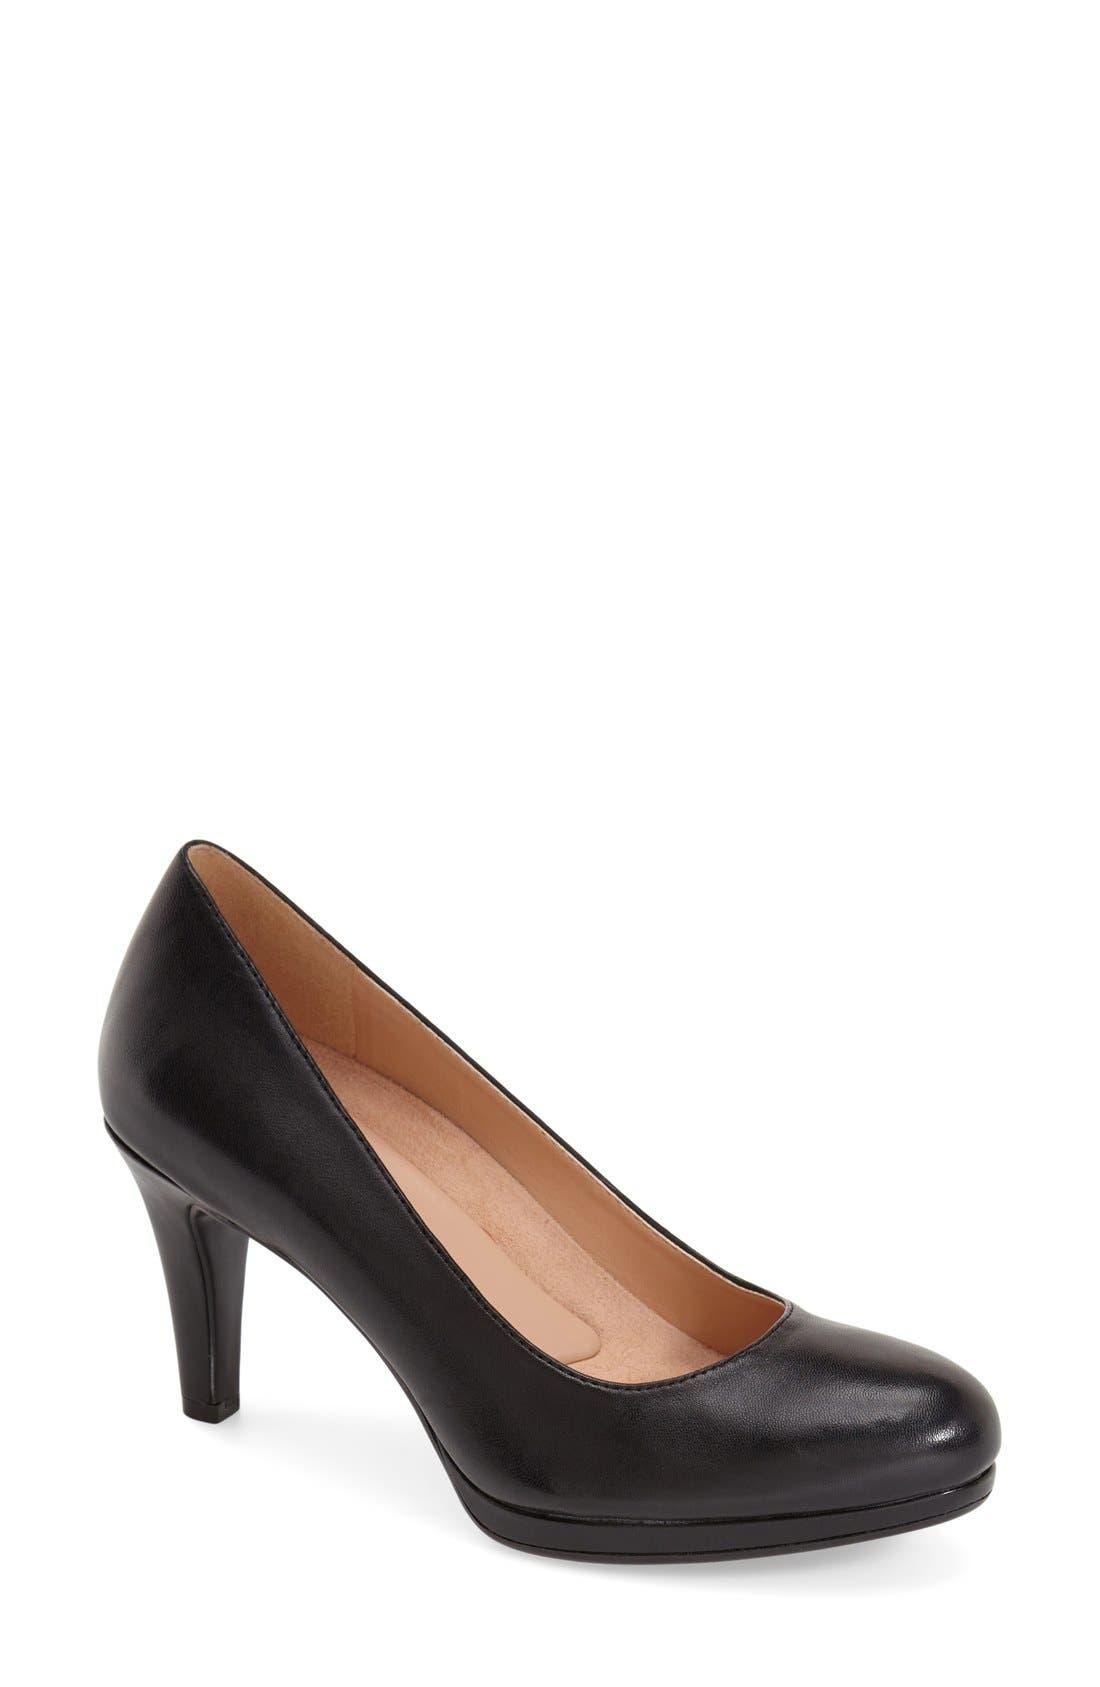 NATURALIZER 'Michelle' Almond Toe Pump, Main, color, BLACK LEATHER